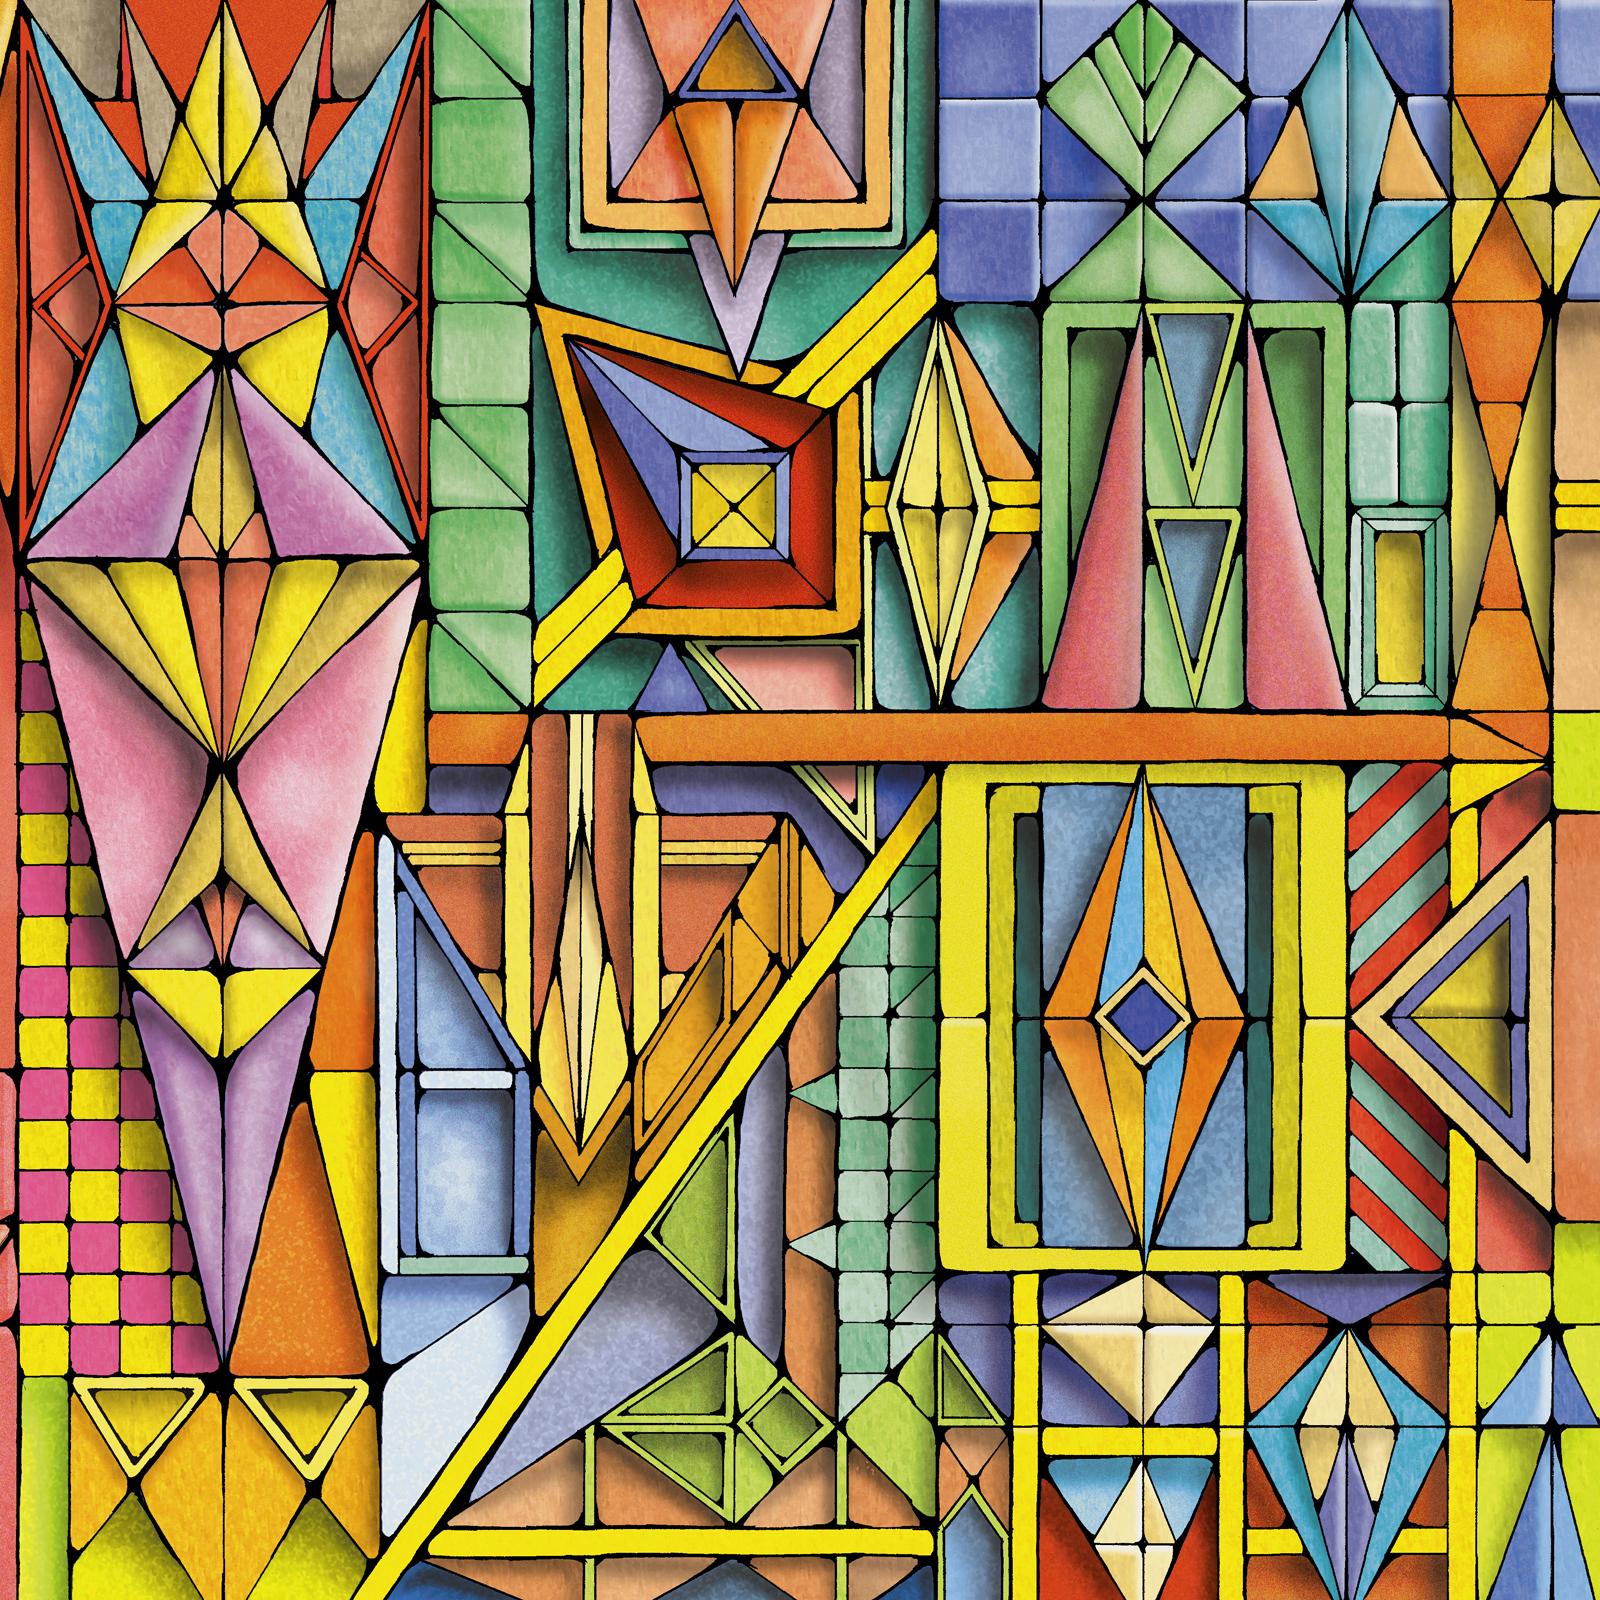 https://www.binaural.es/wp-content/uploads/2019/01/Hibrido_I_Artwork.jpg